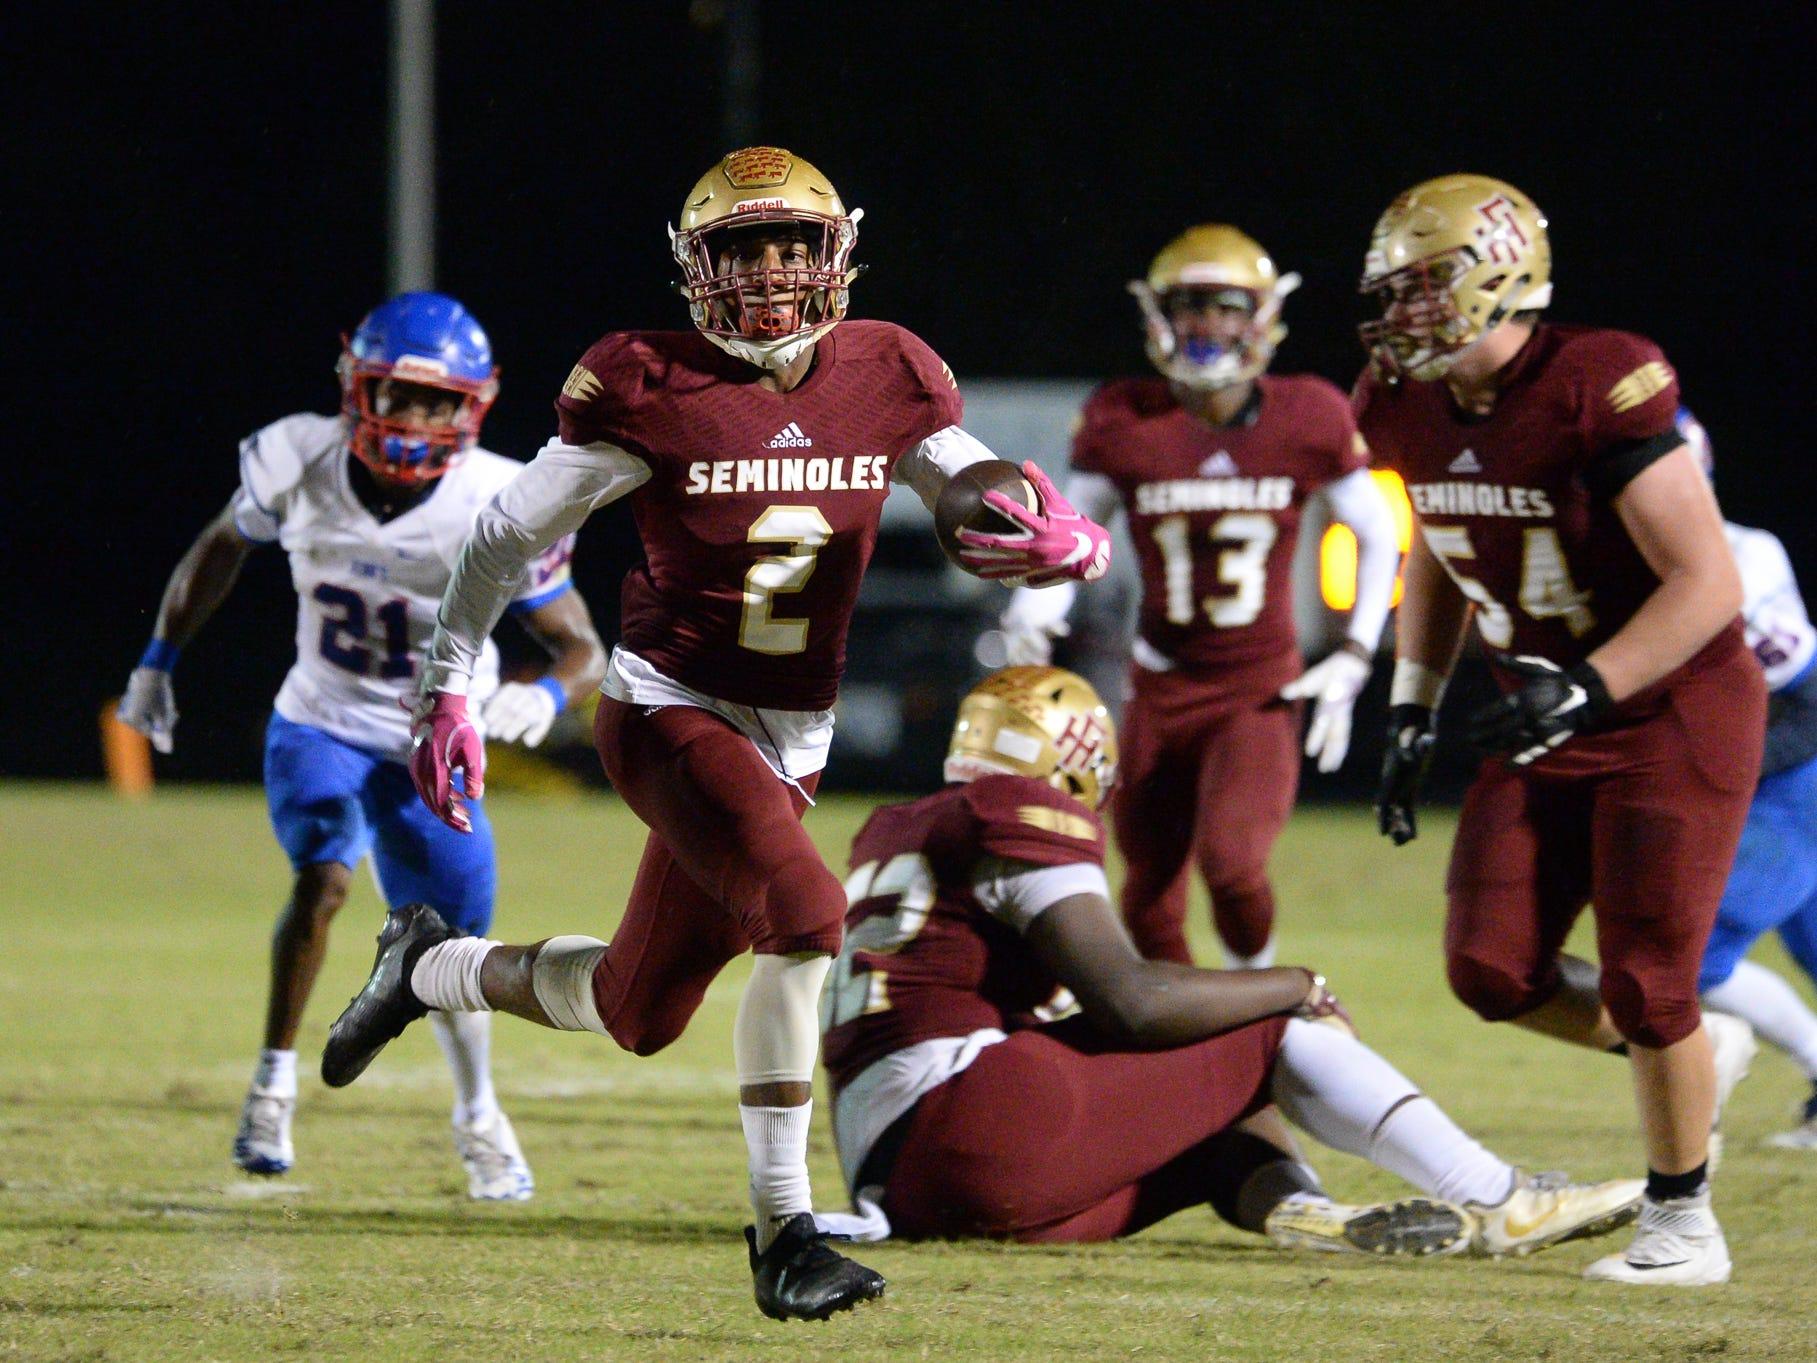 Florida High Javan Morgan (2) carries the ball during the King's Academy Lions vs. Florida High Seminoles, Class 3A state semifinal, Tallahassee, FL, Nov. 30, 2018.